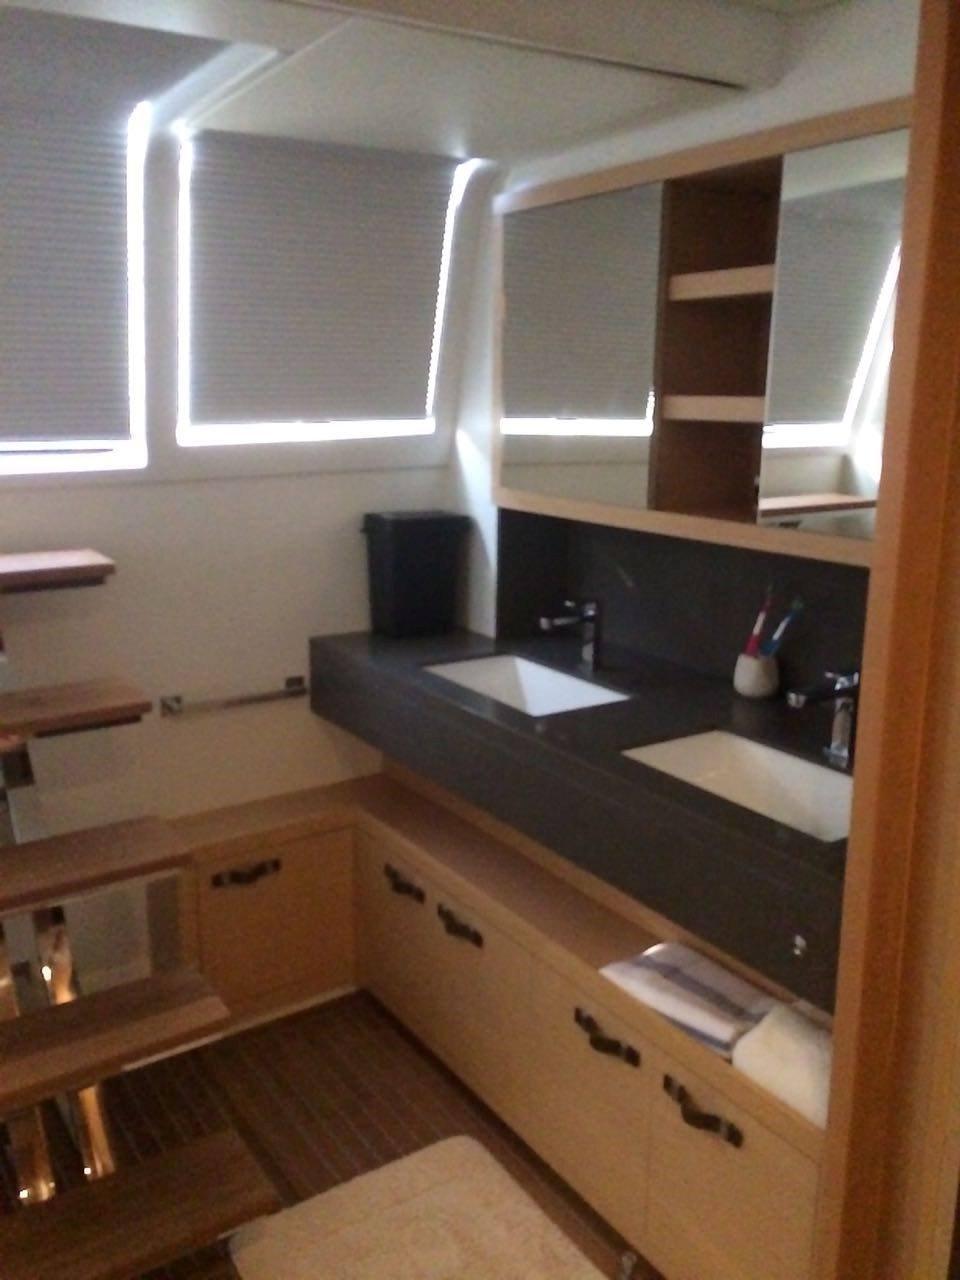 Master cabin sink